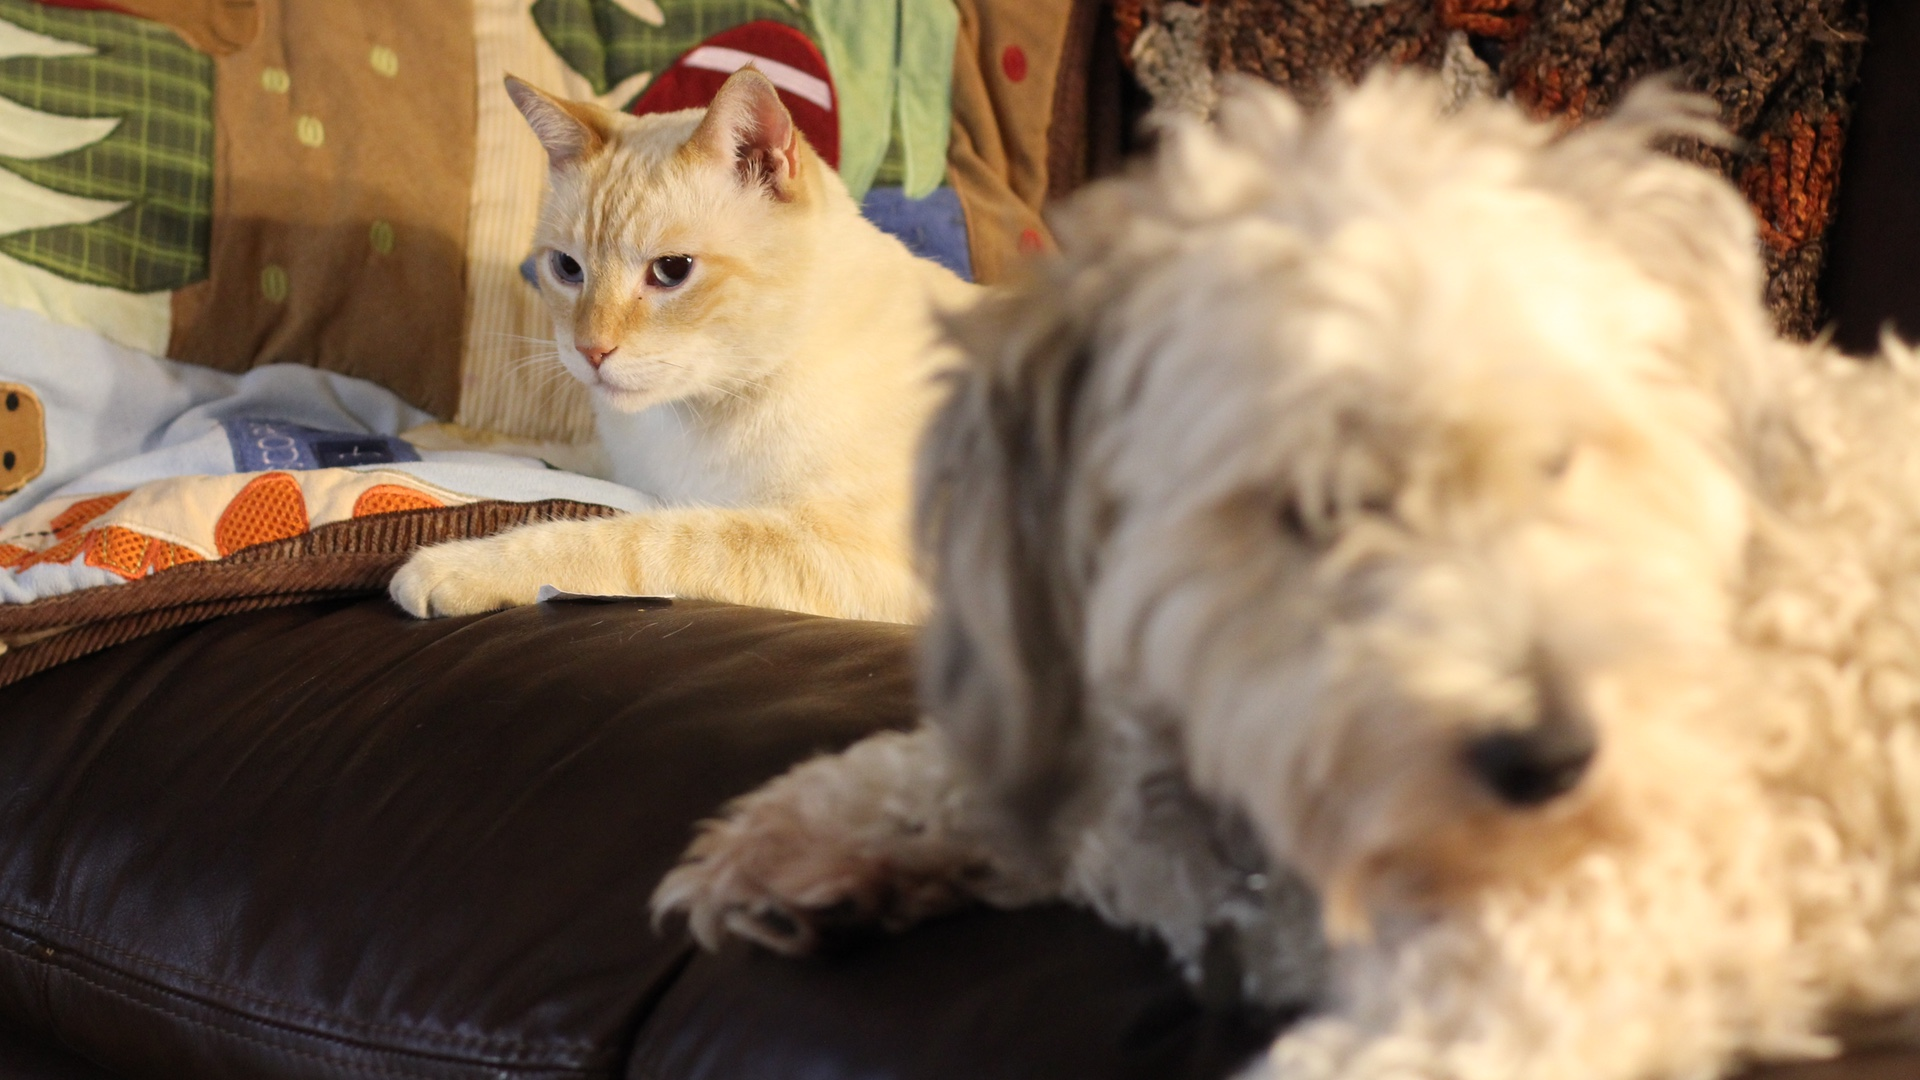 Ko'a and Lola